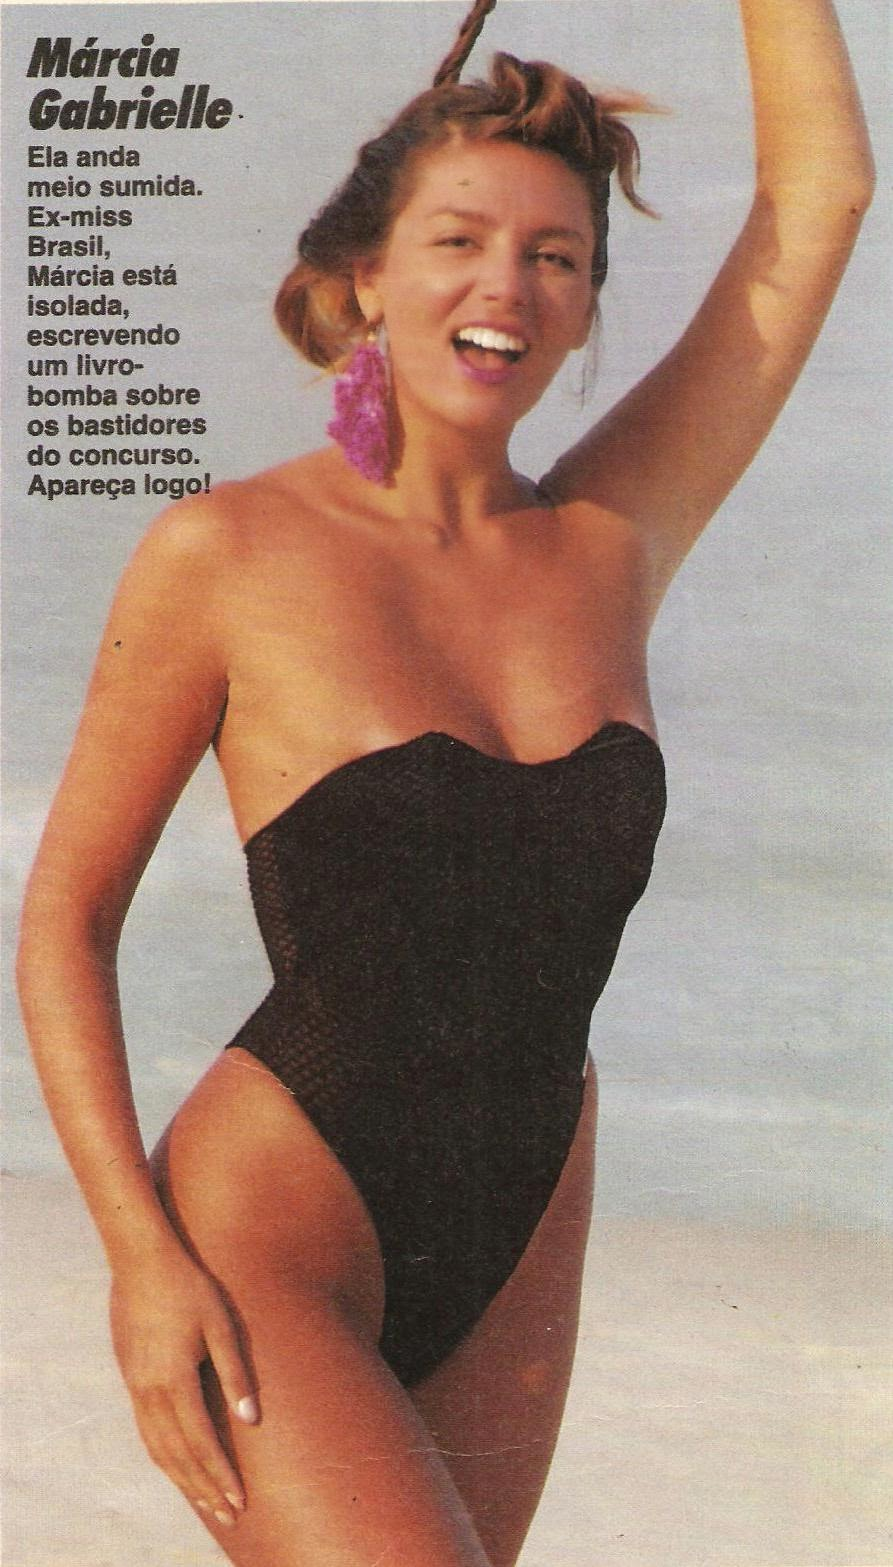 marcia gabrielle, miss brasil 1985. Image240